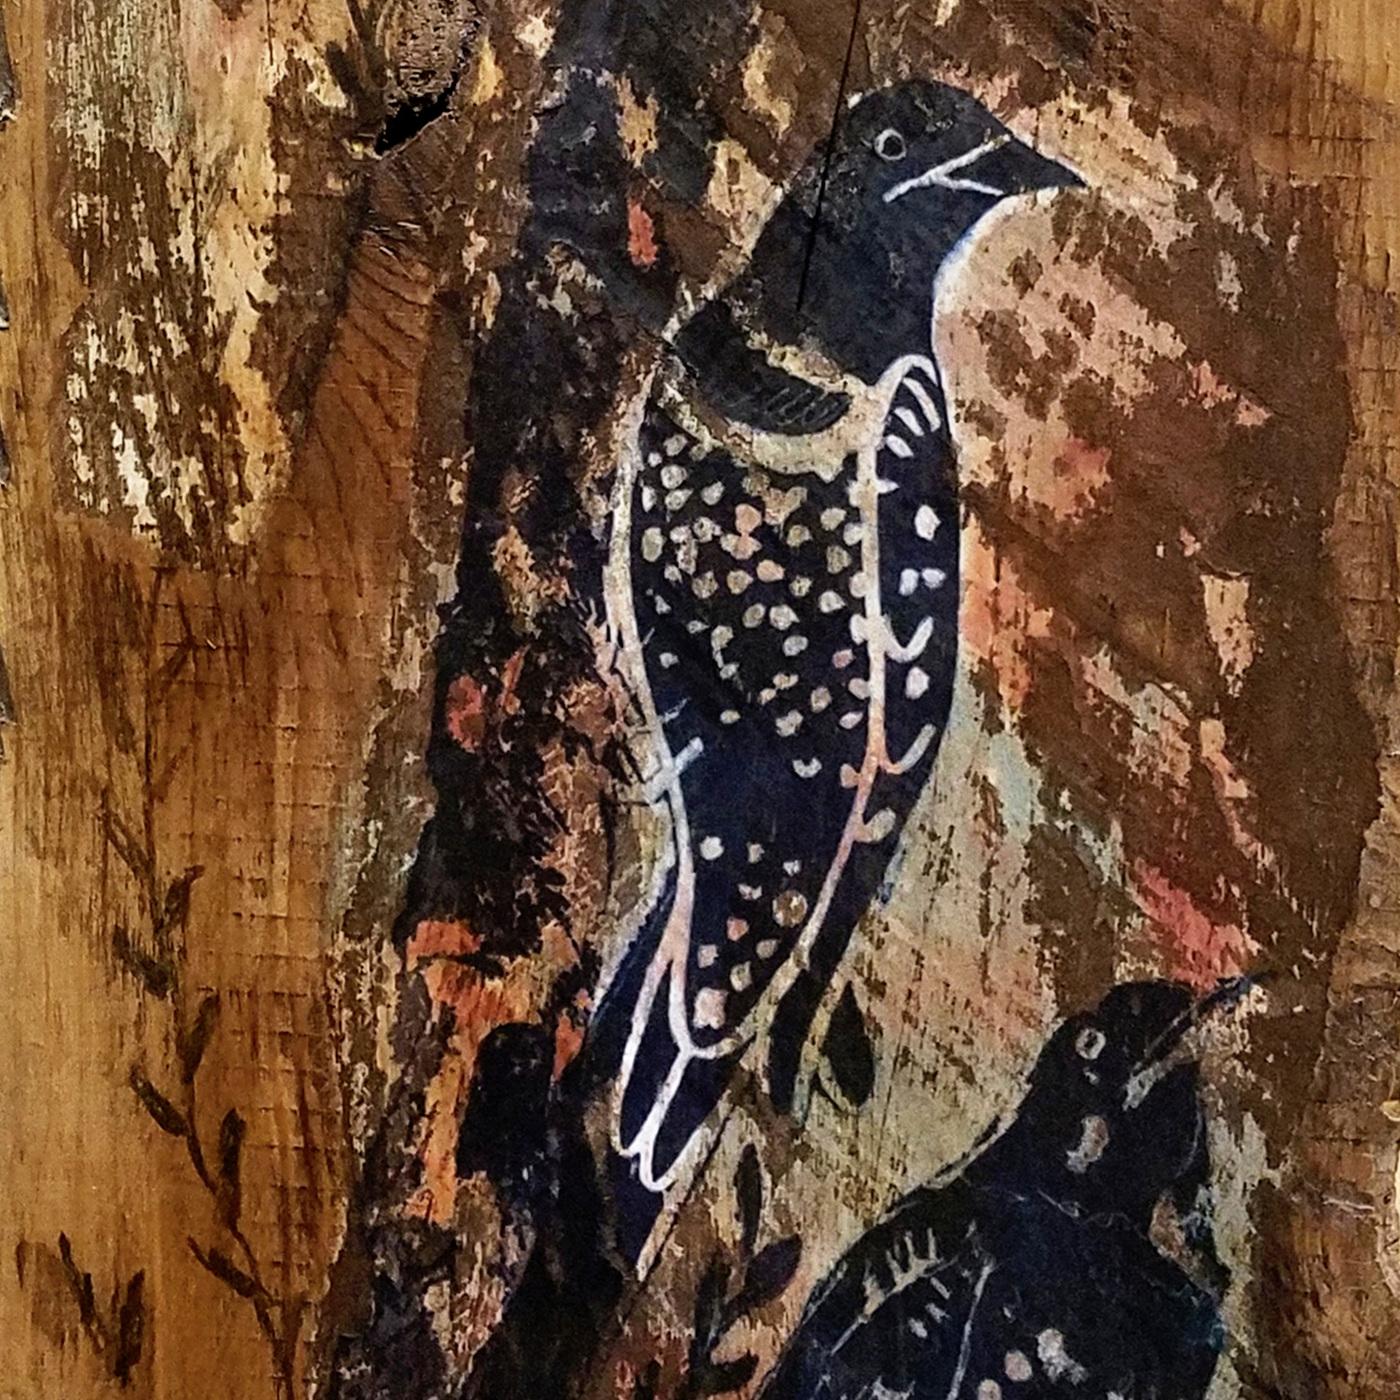 WOODsconsin_Jon_Malm_home_decor_birds